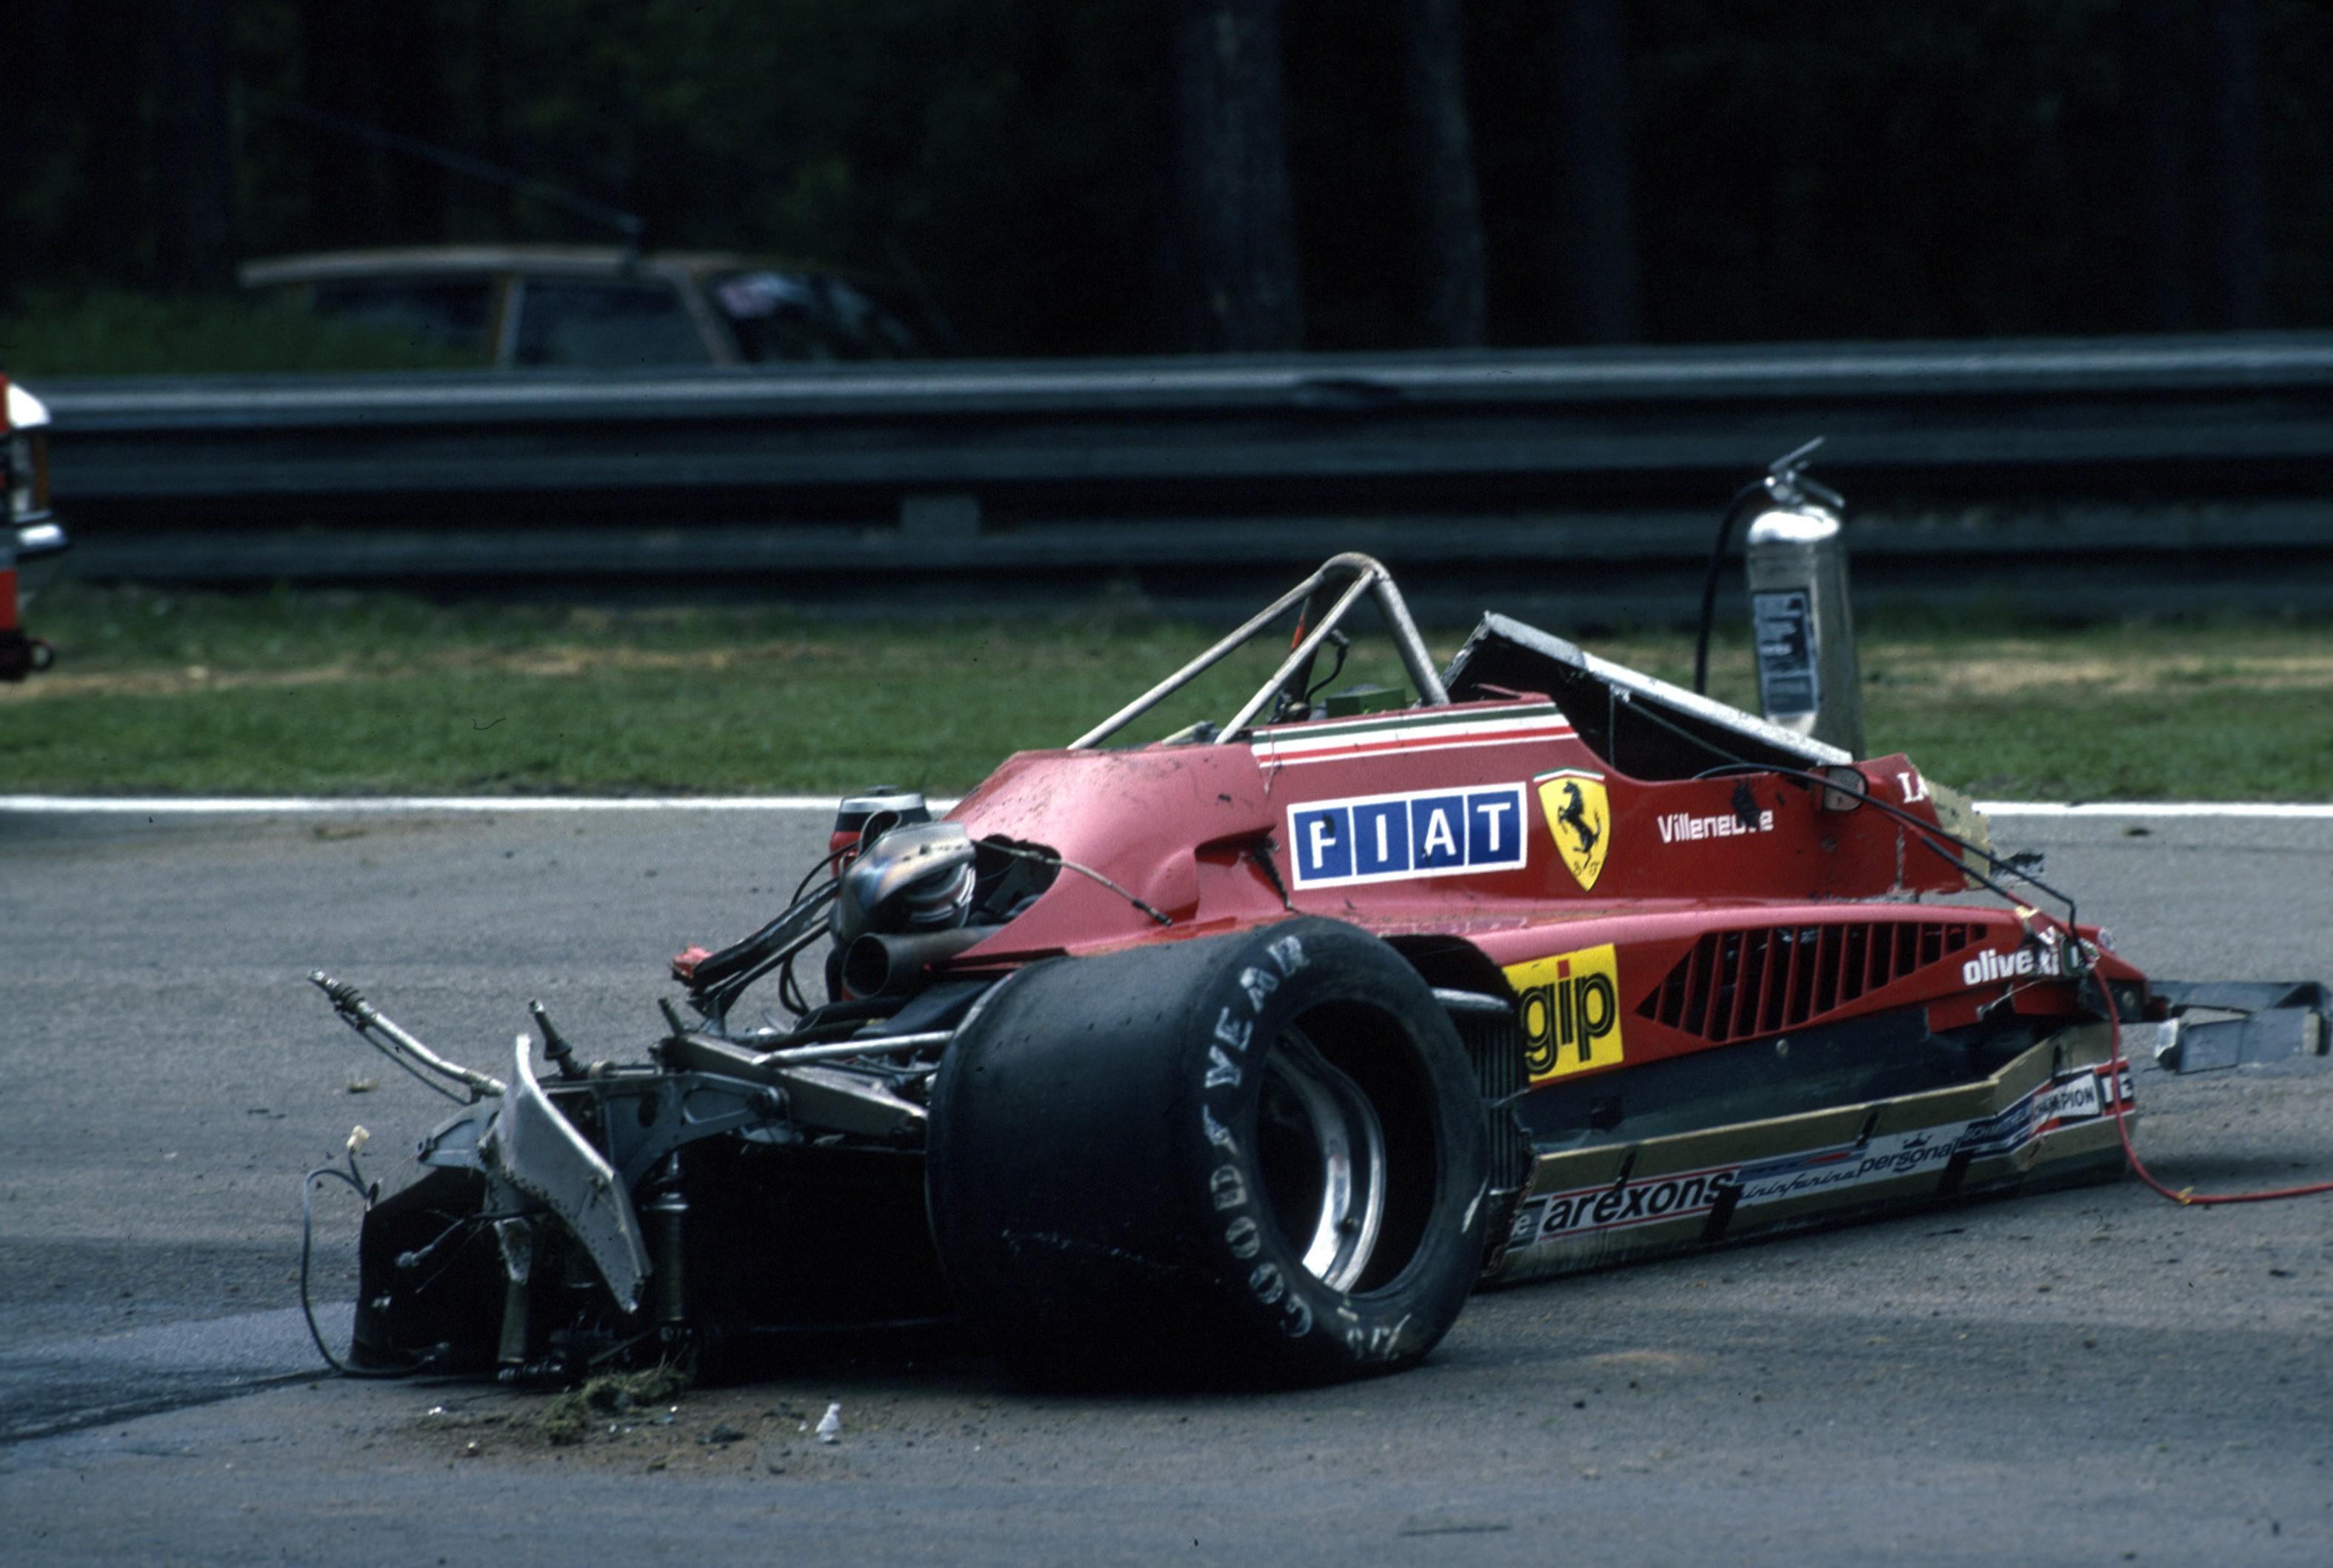 La Ferrari après l'accident de Gilles Villeneuve au Grand Prix de Belgique 1982